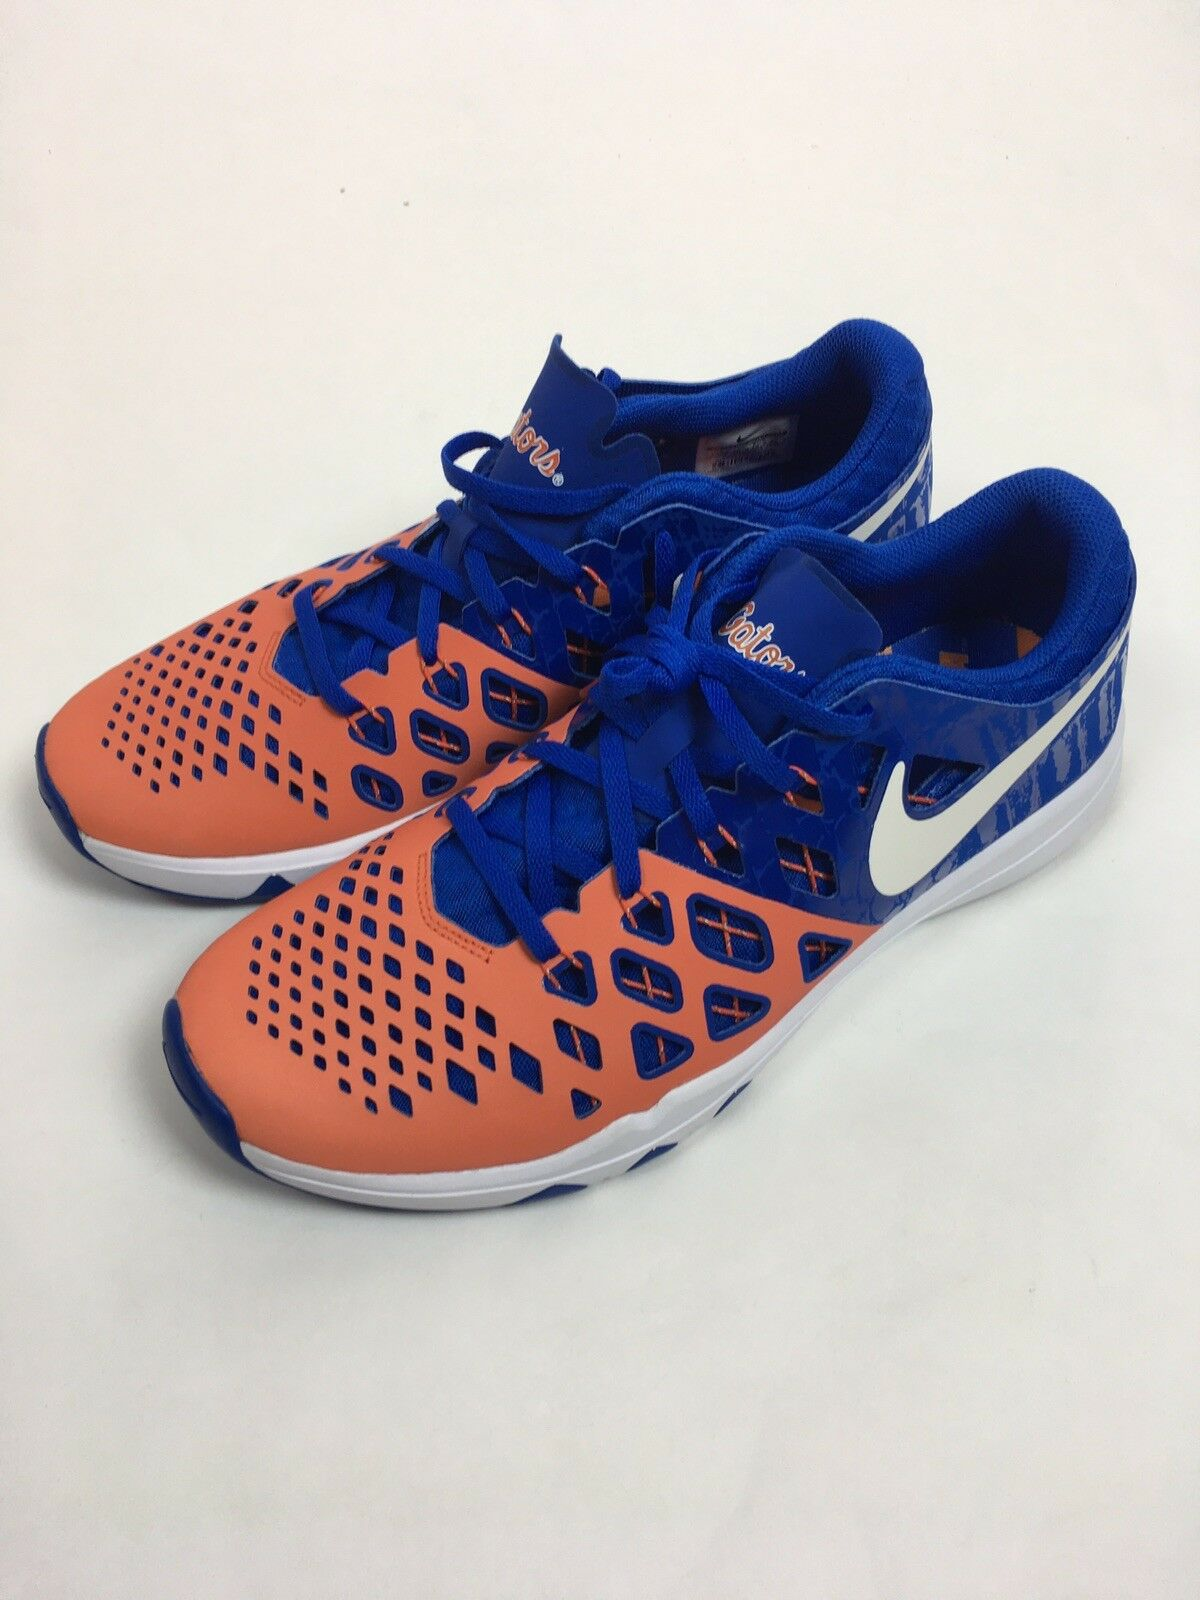 Men's Nike Train Speed Amp Florida Gators Shoes - Size - 11.5 - Brand New